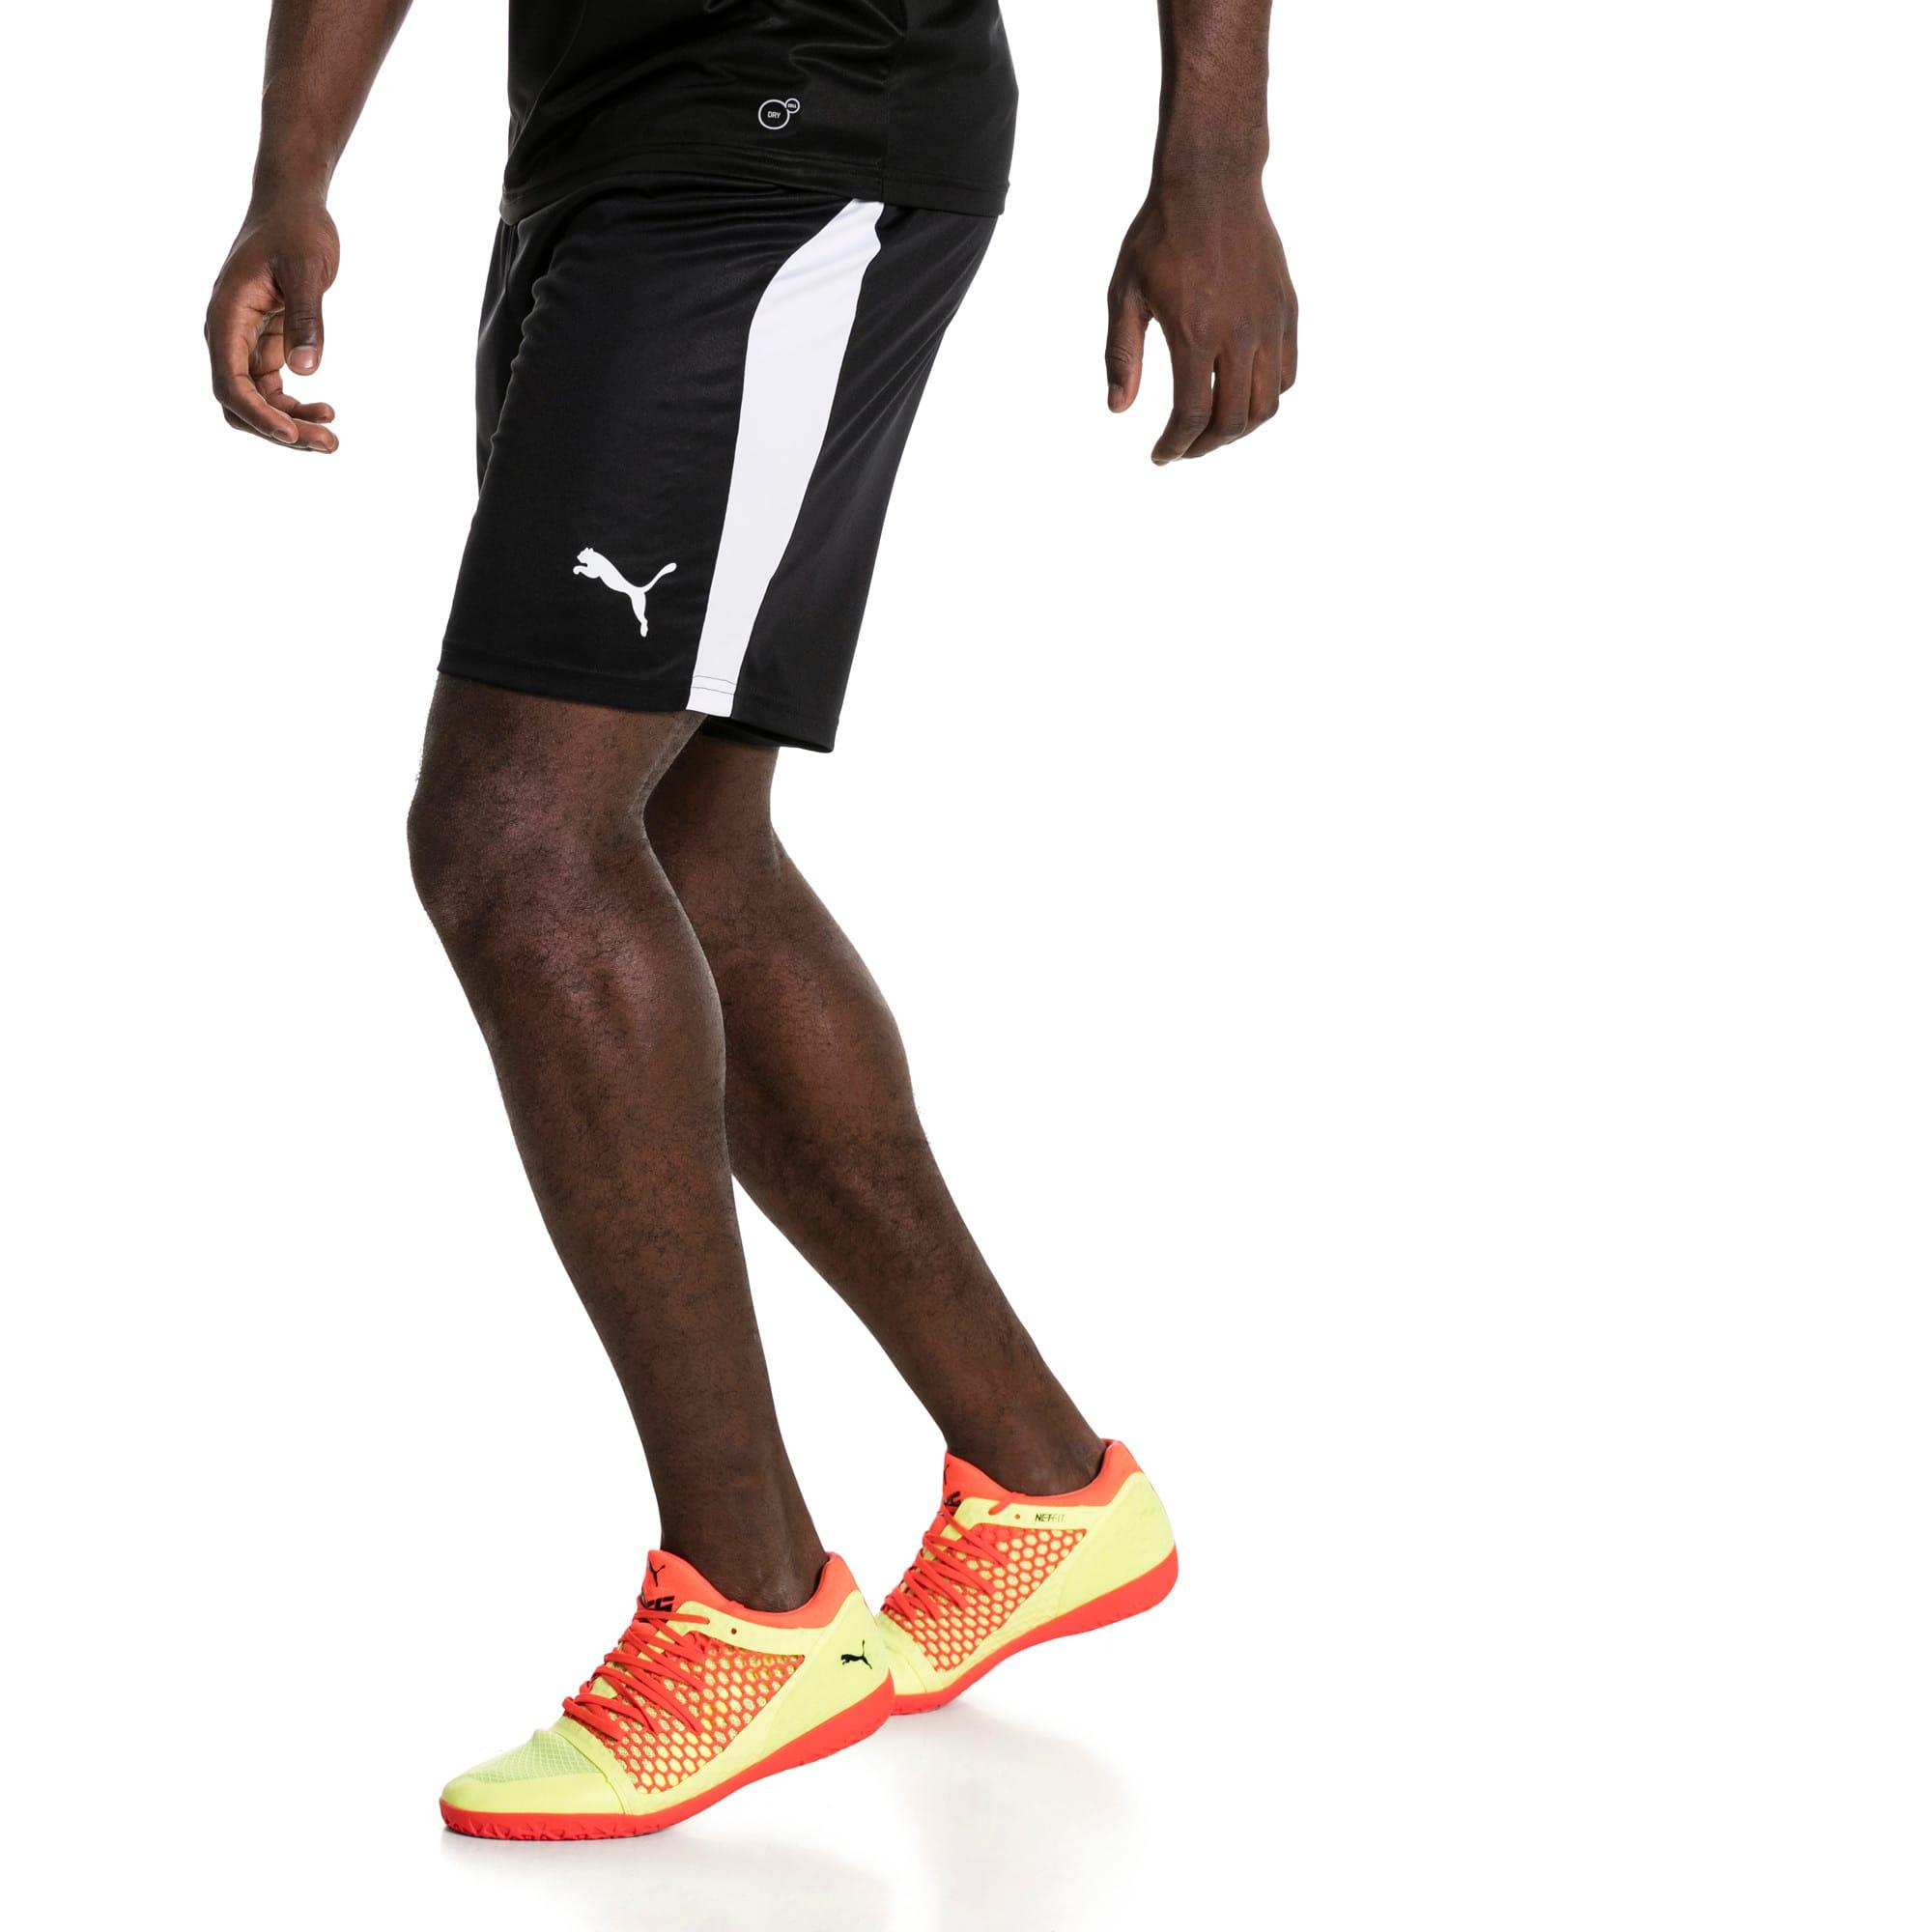 Thumbnail 2 of Liga Men's Shorts, Puma Black-Puma White, medium